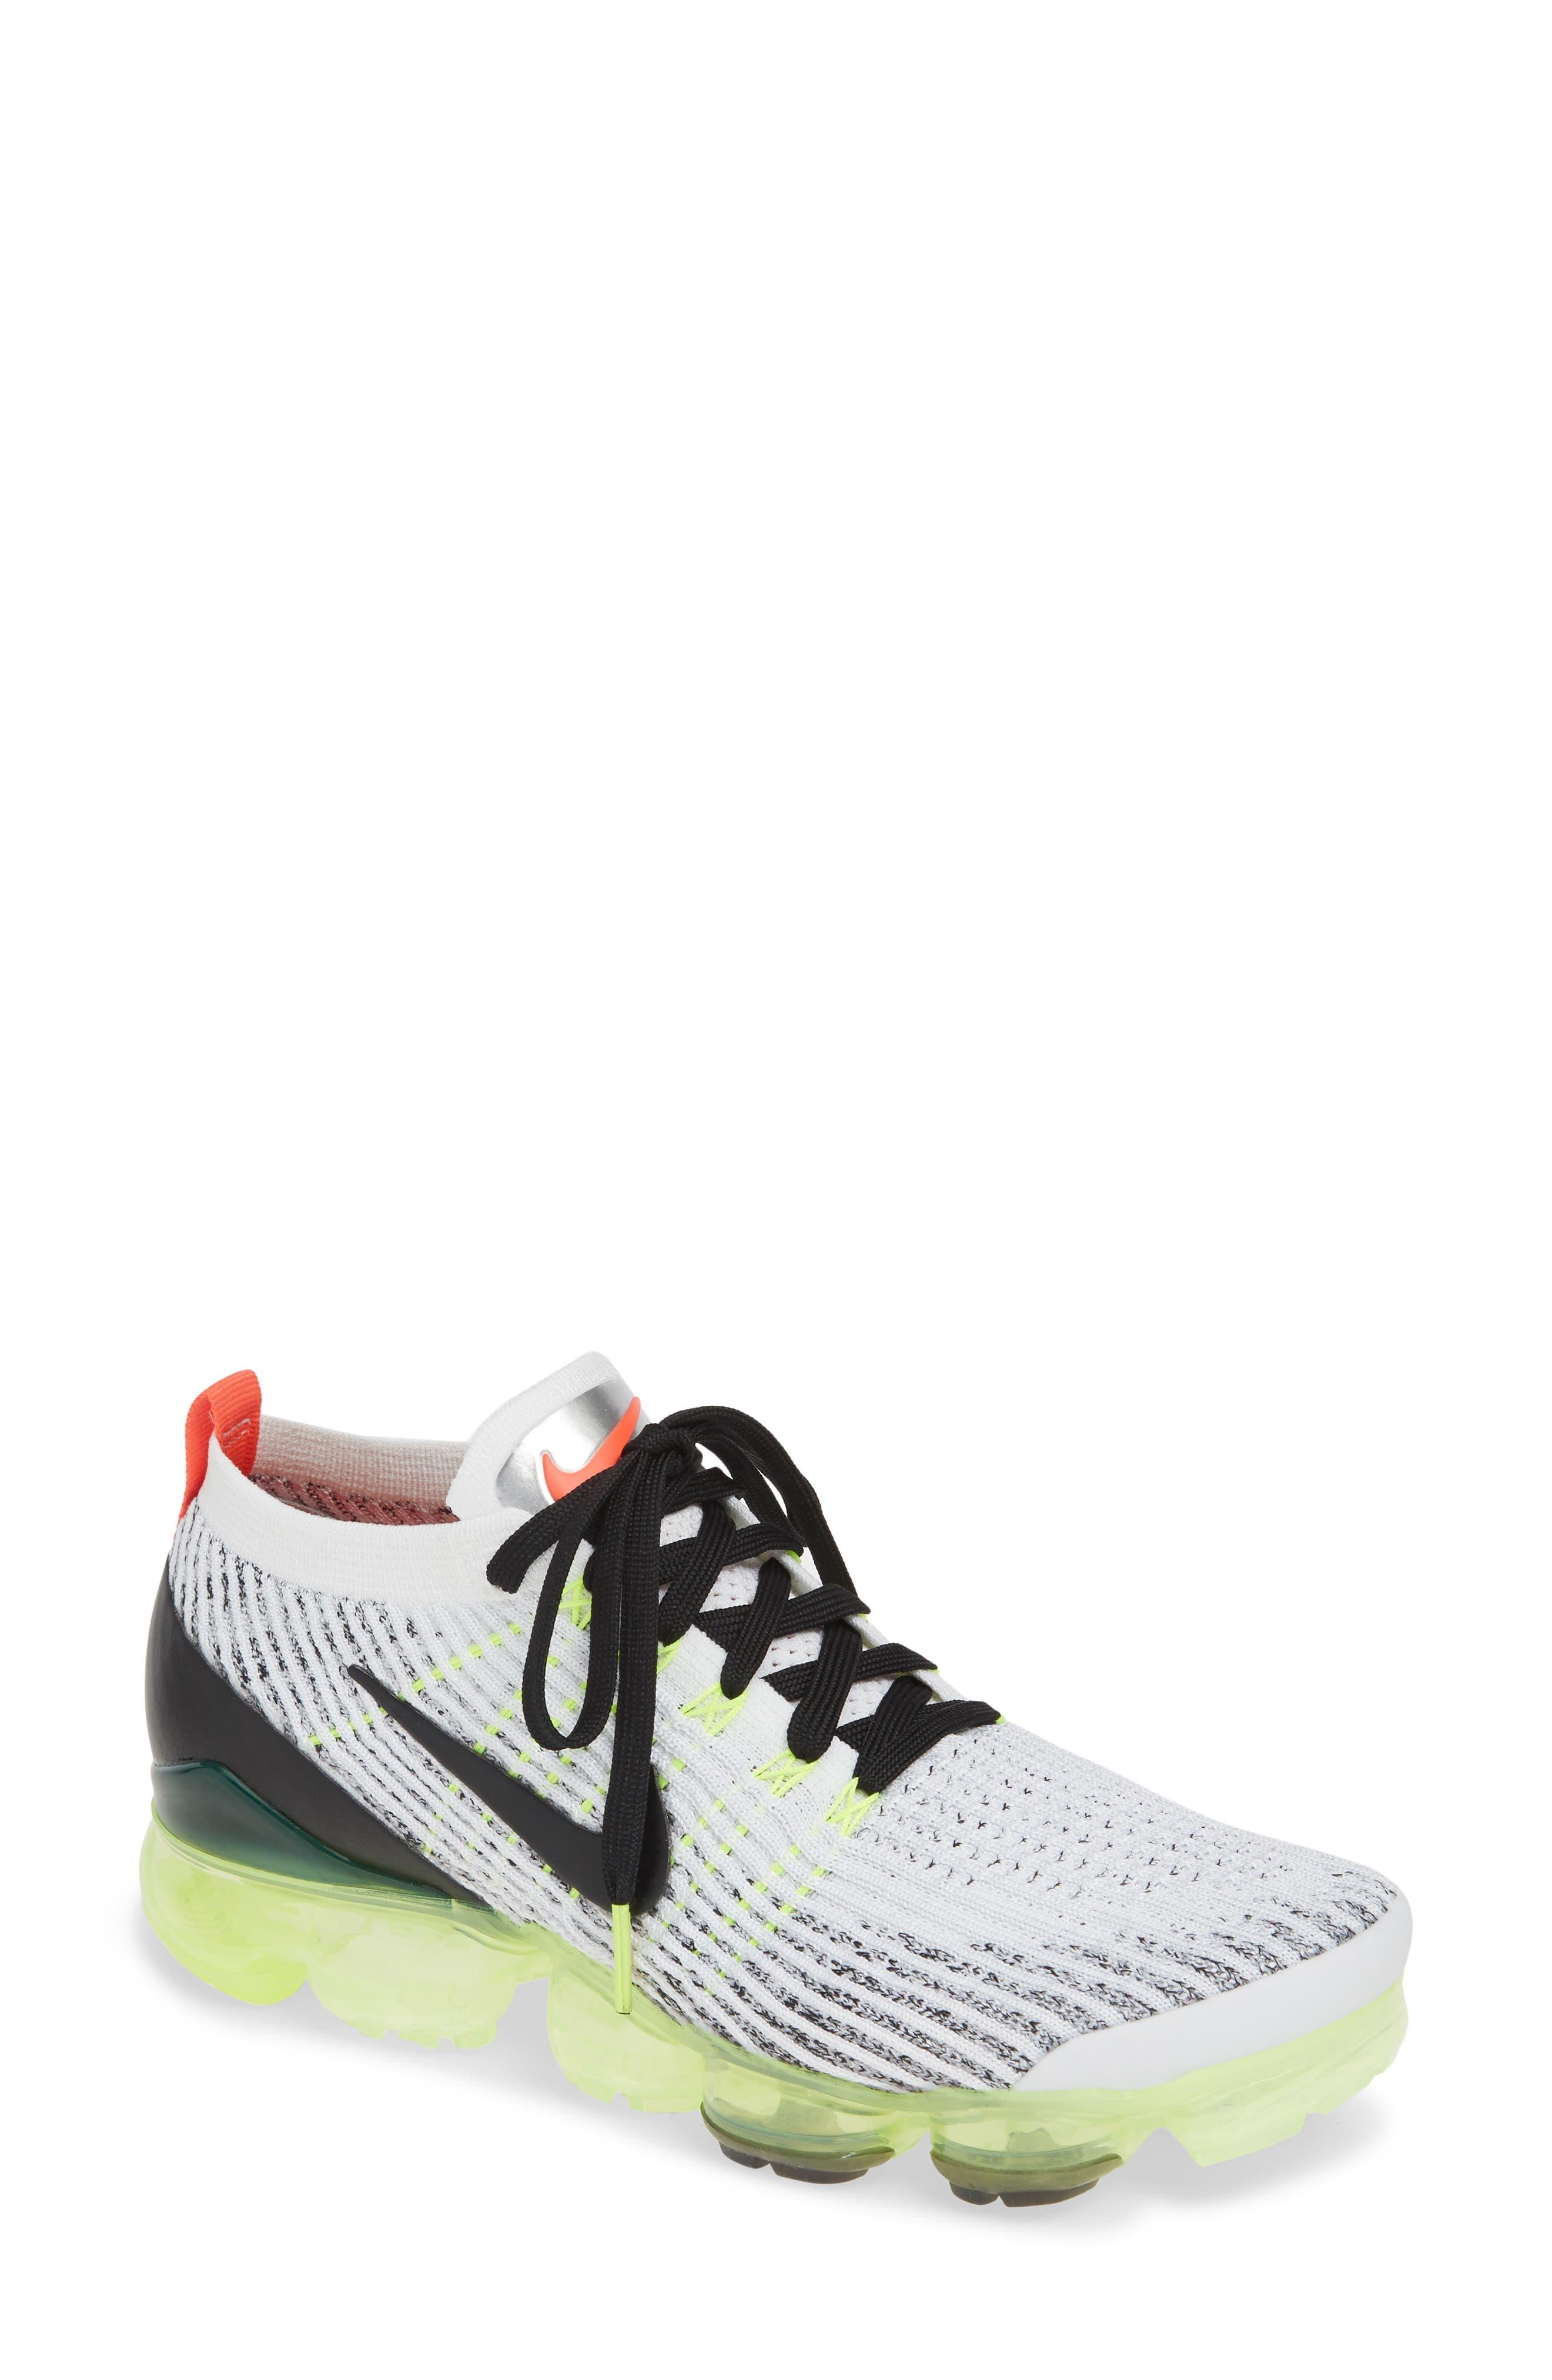 ab3ce3f62e26 Nike Flyknit